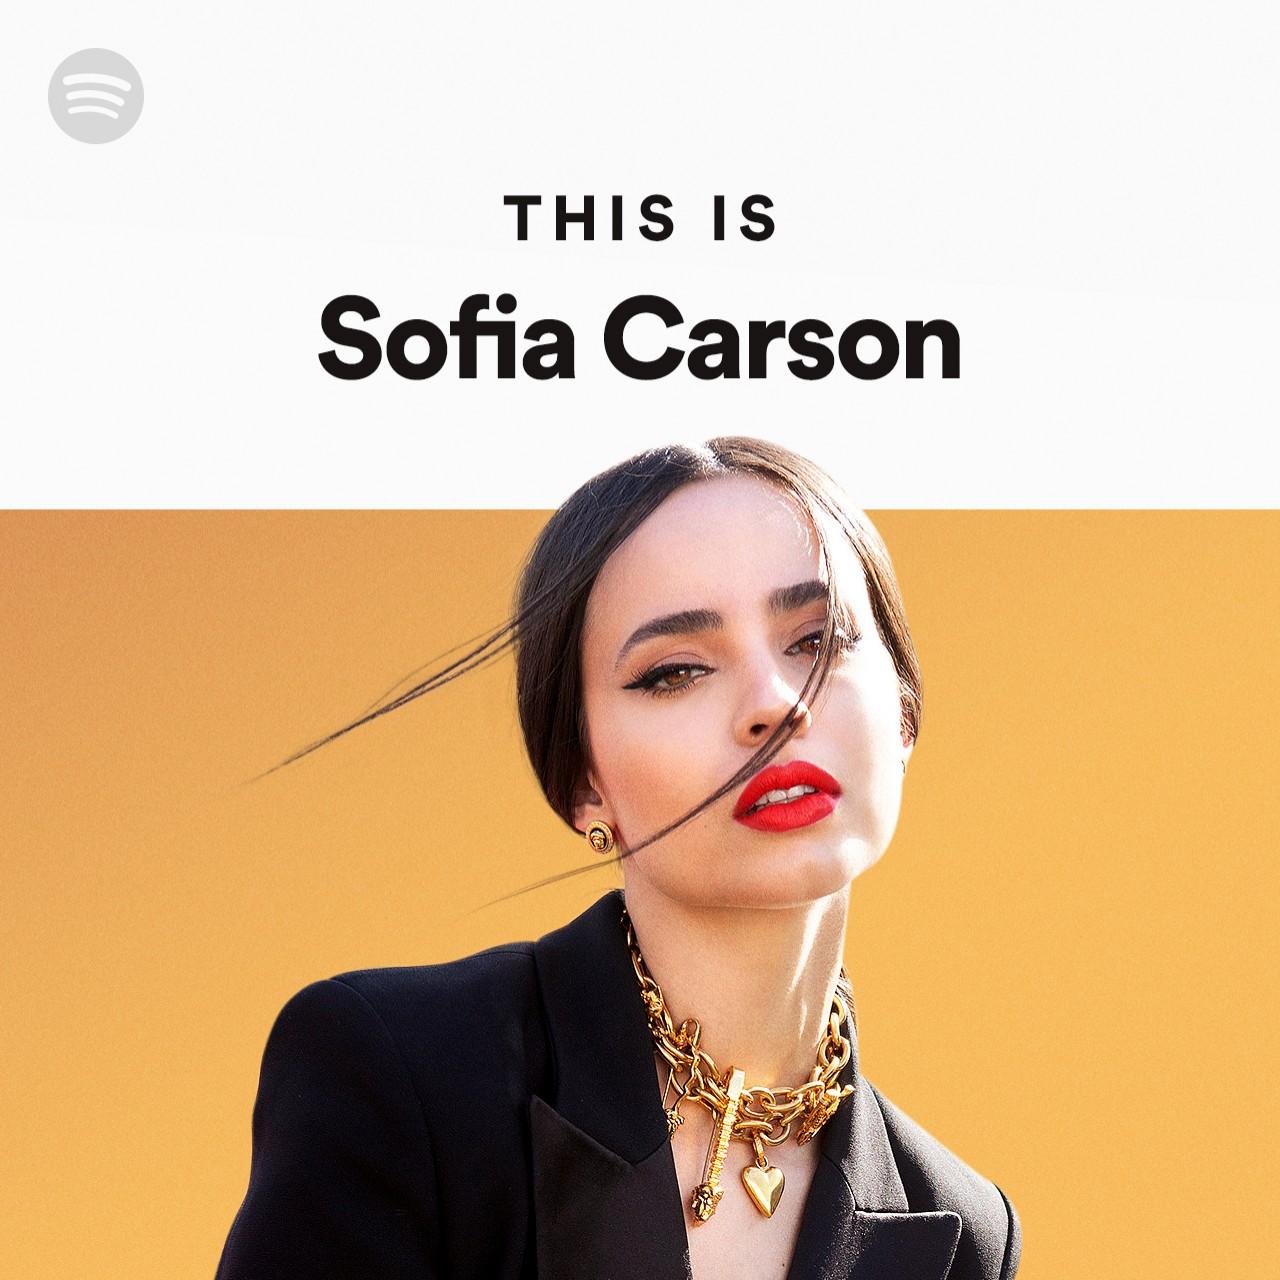 This Is Sofia Carson